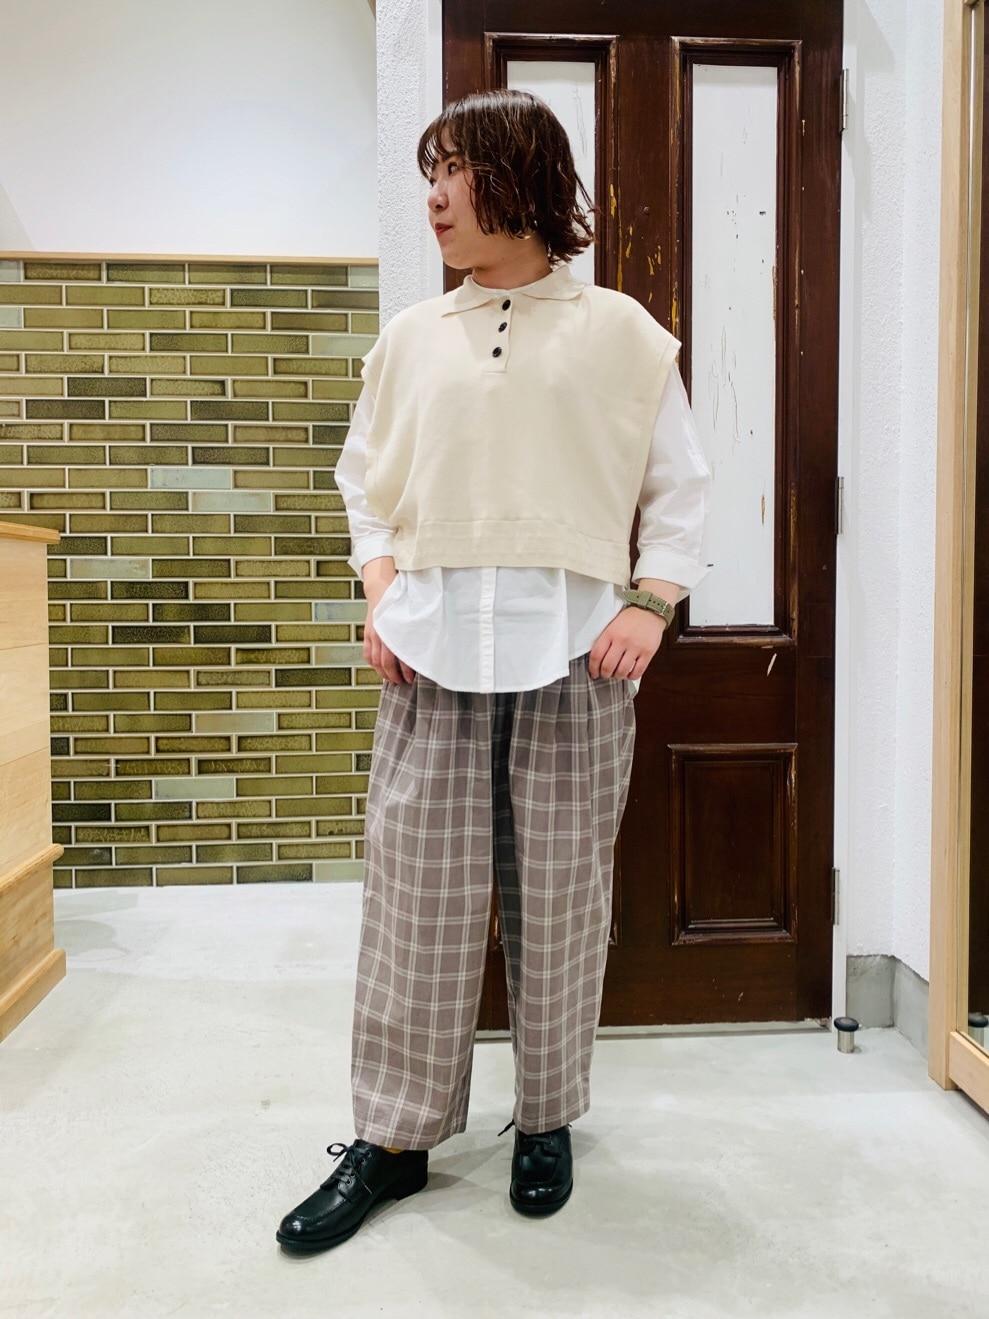 chambre de charme 横浜ジョイナス 身長:155cm 2020.10.05